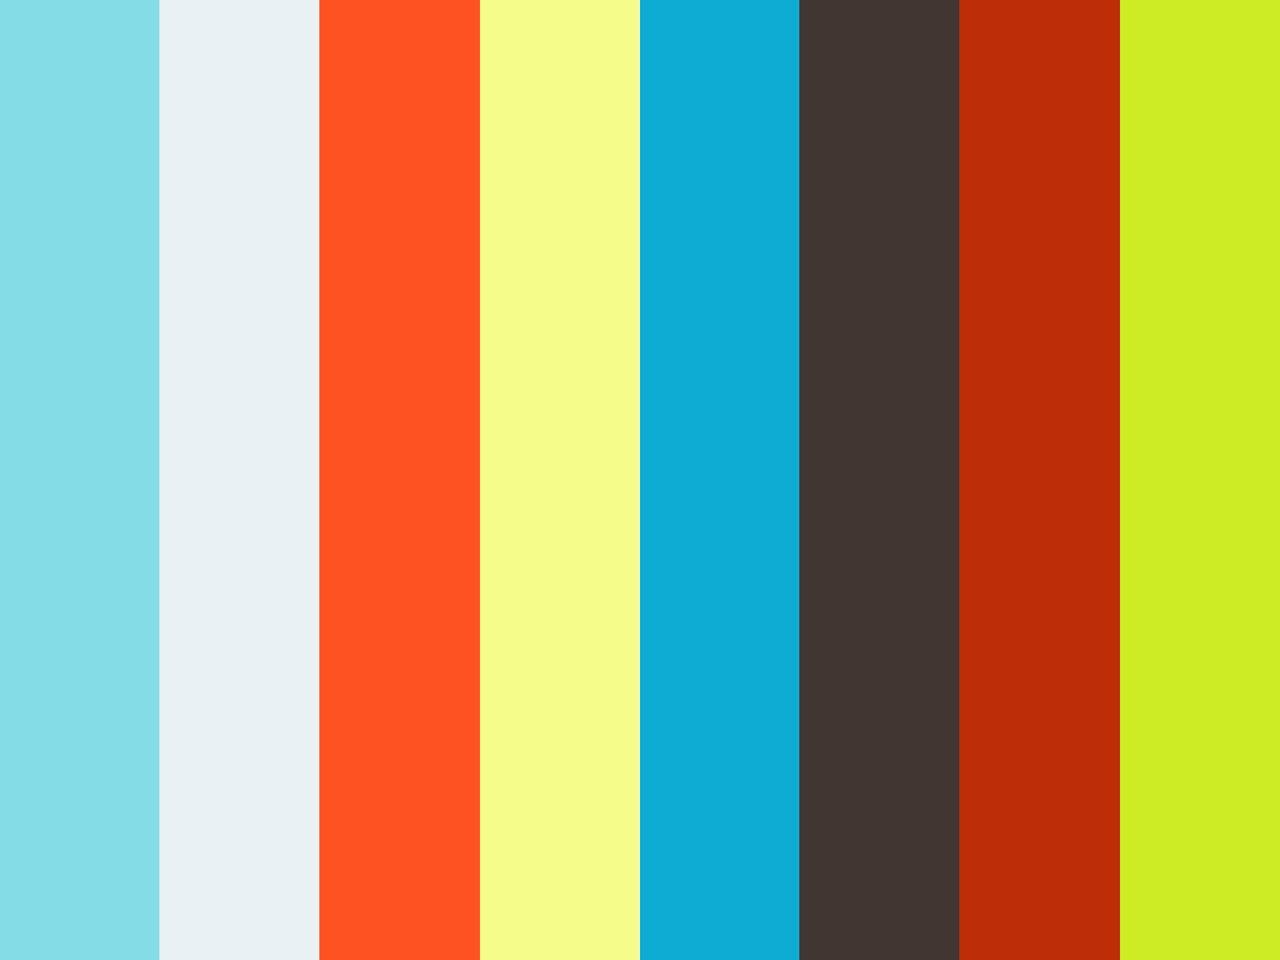 FYI@OCI 9.22.15